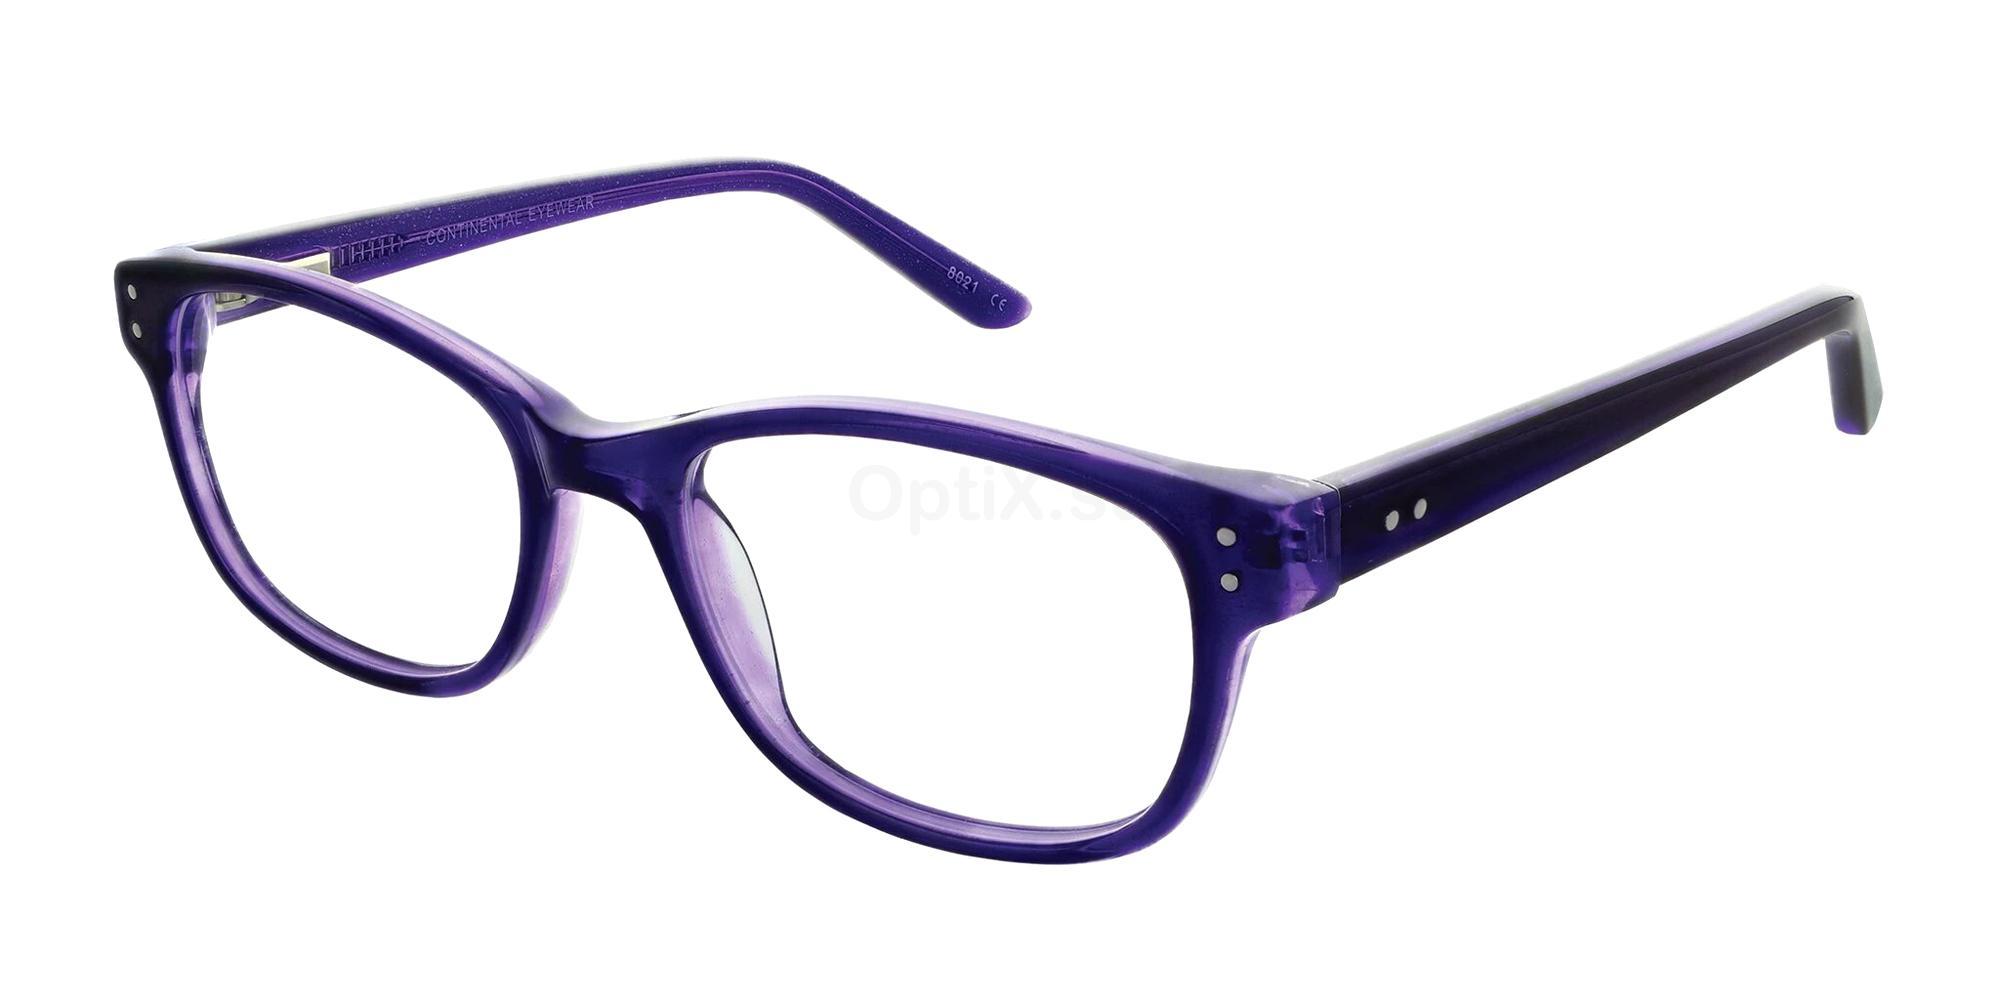 Purple 75 Glasses, Zenith Zest